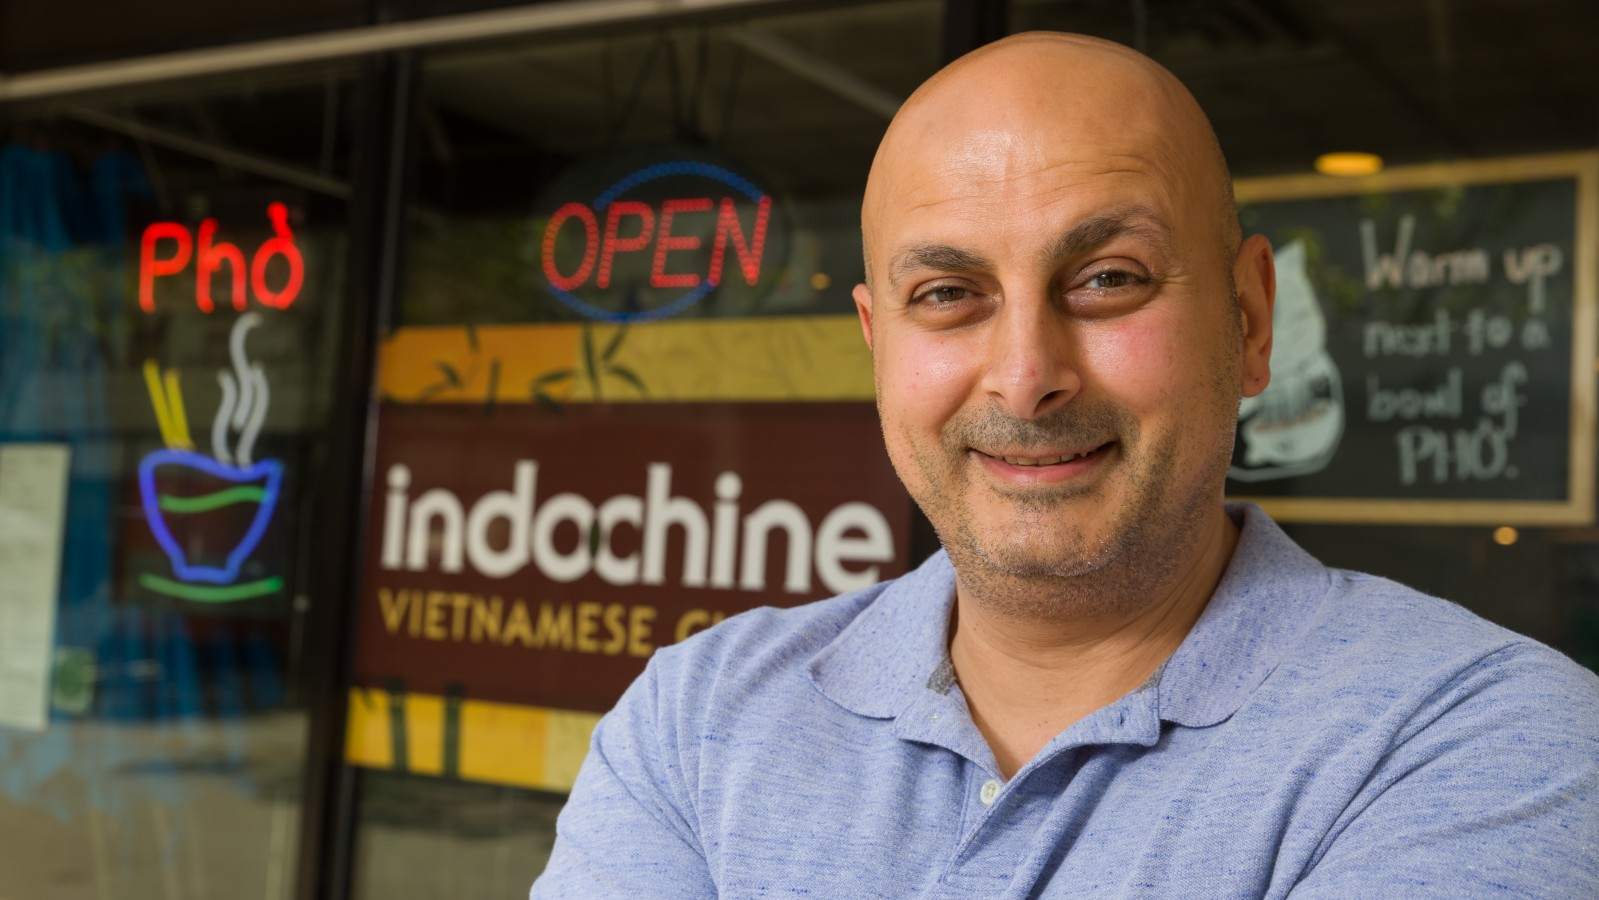 Photo of Indochine